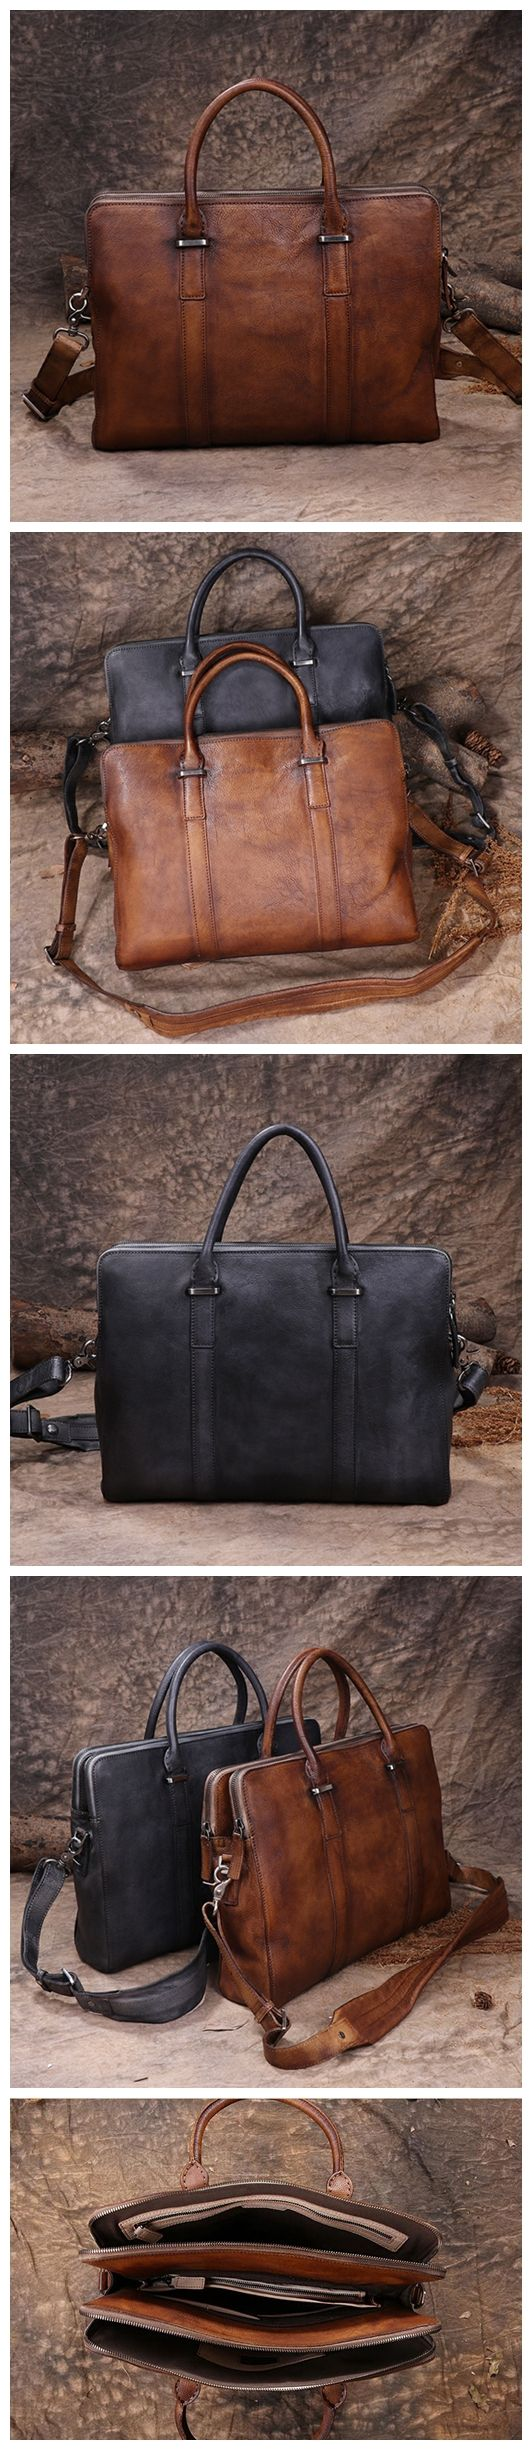 Handmade Vintage Leather Briefcase Men's Business Bag Handbag Men Fashion Laptop Bag 14119 Overview: Design: Vintage Leather Men Briefcase In Stock: 4-5 days For Making Include: Only Leather Briefcase